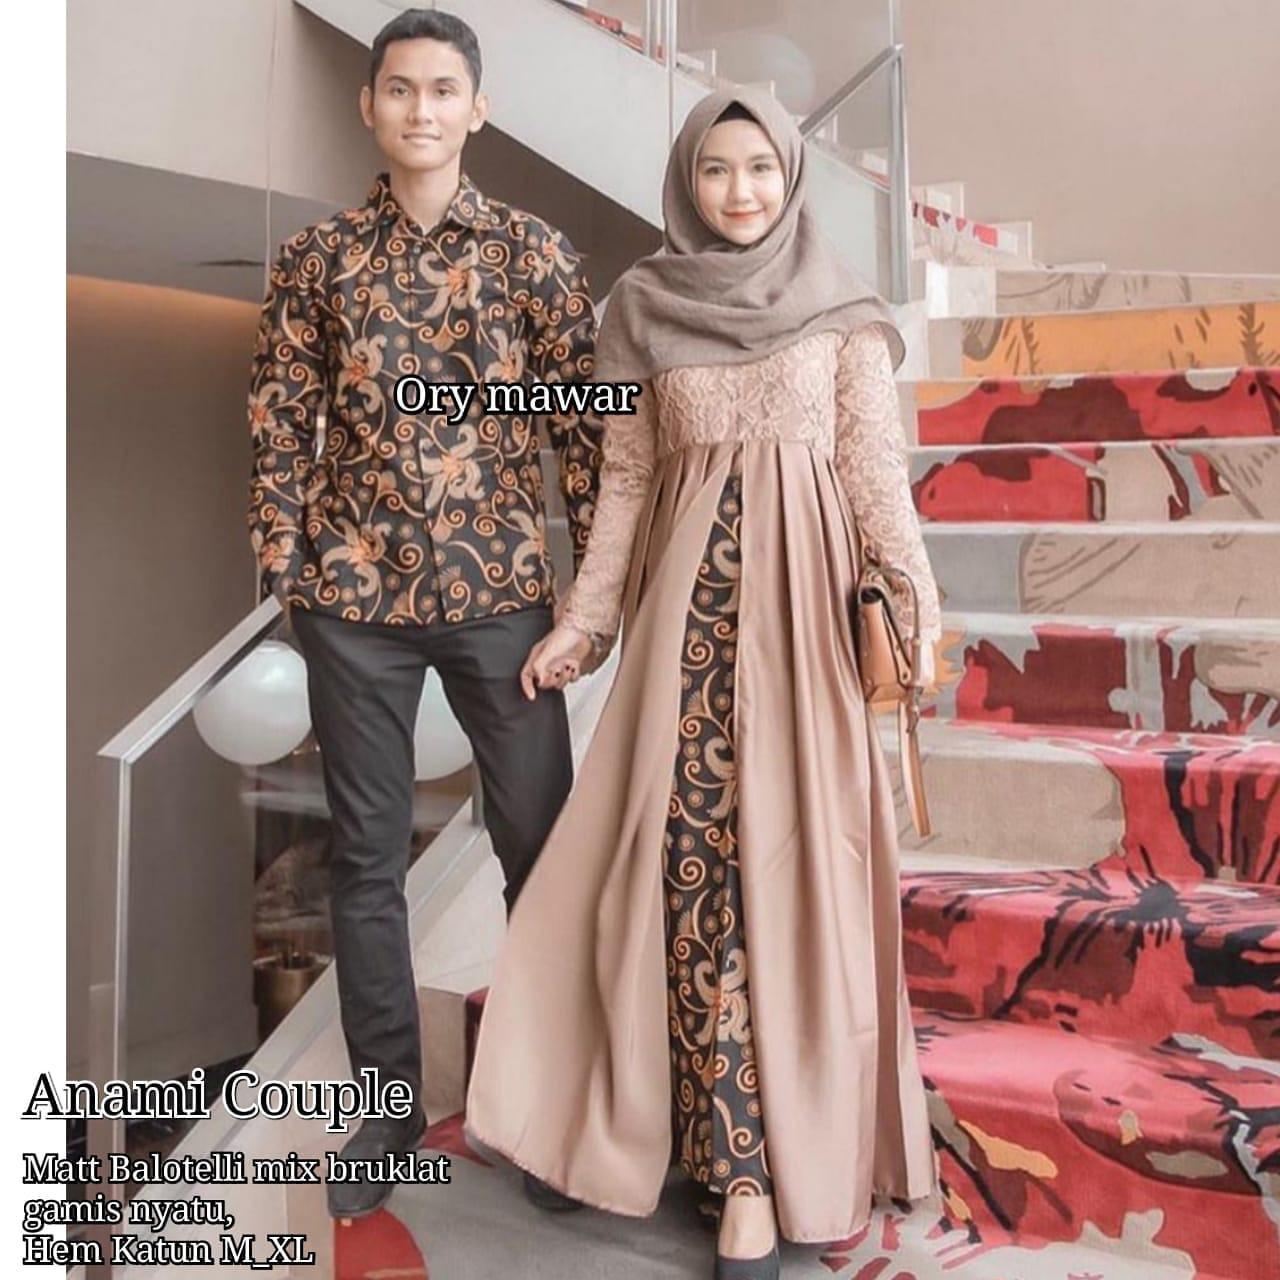 TERMURAH - Batik Couple   Couple Batik   Baju Muslim Wanita Terbaru 2018    Batik Murah cf66f07da1